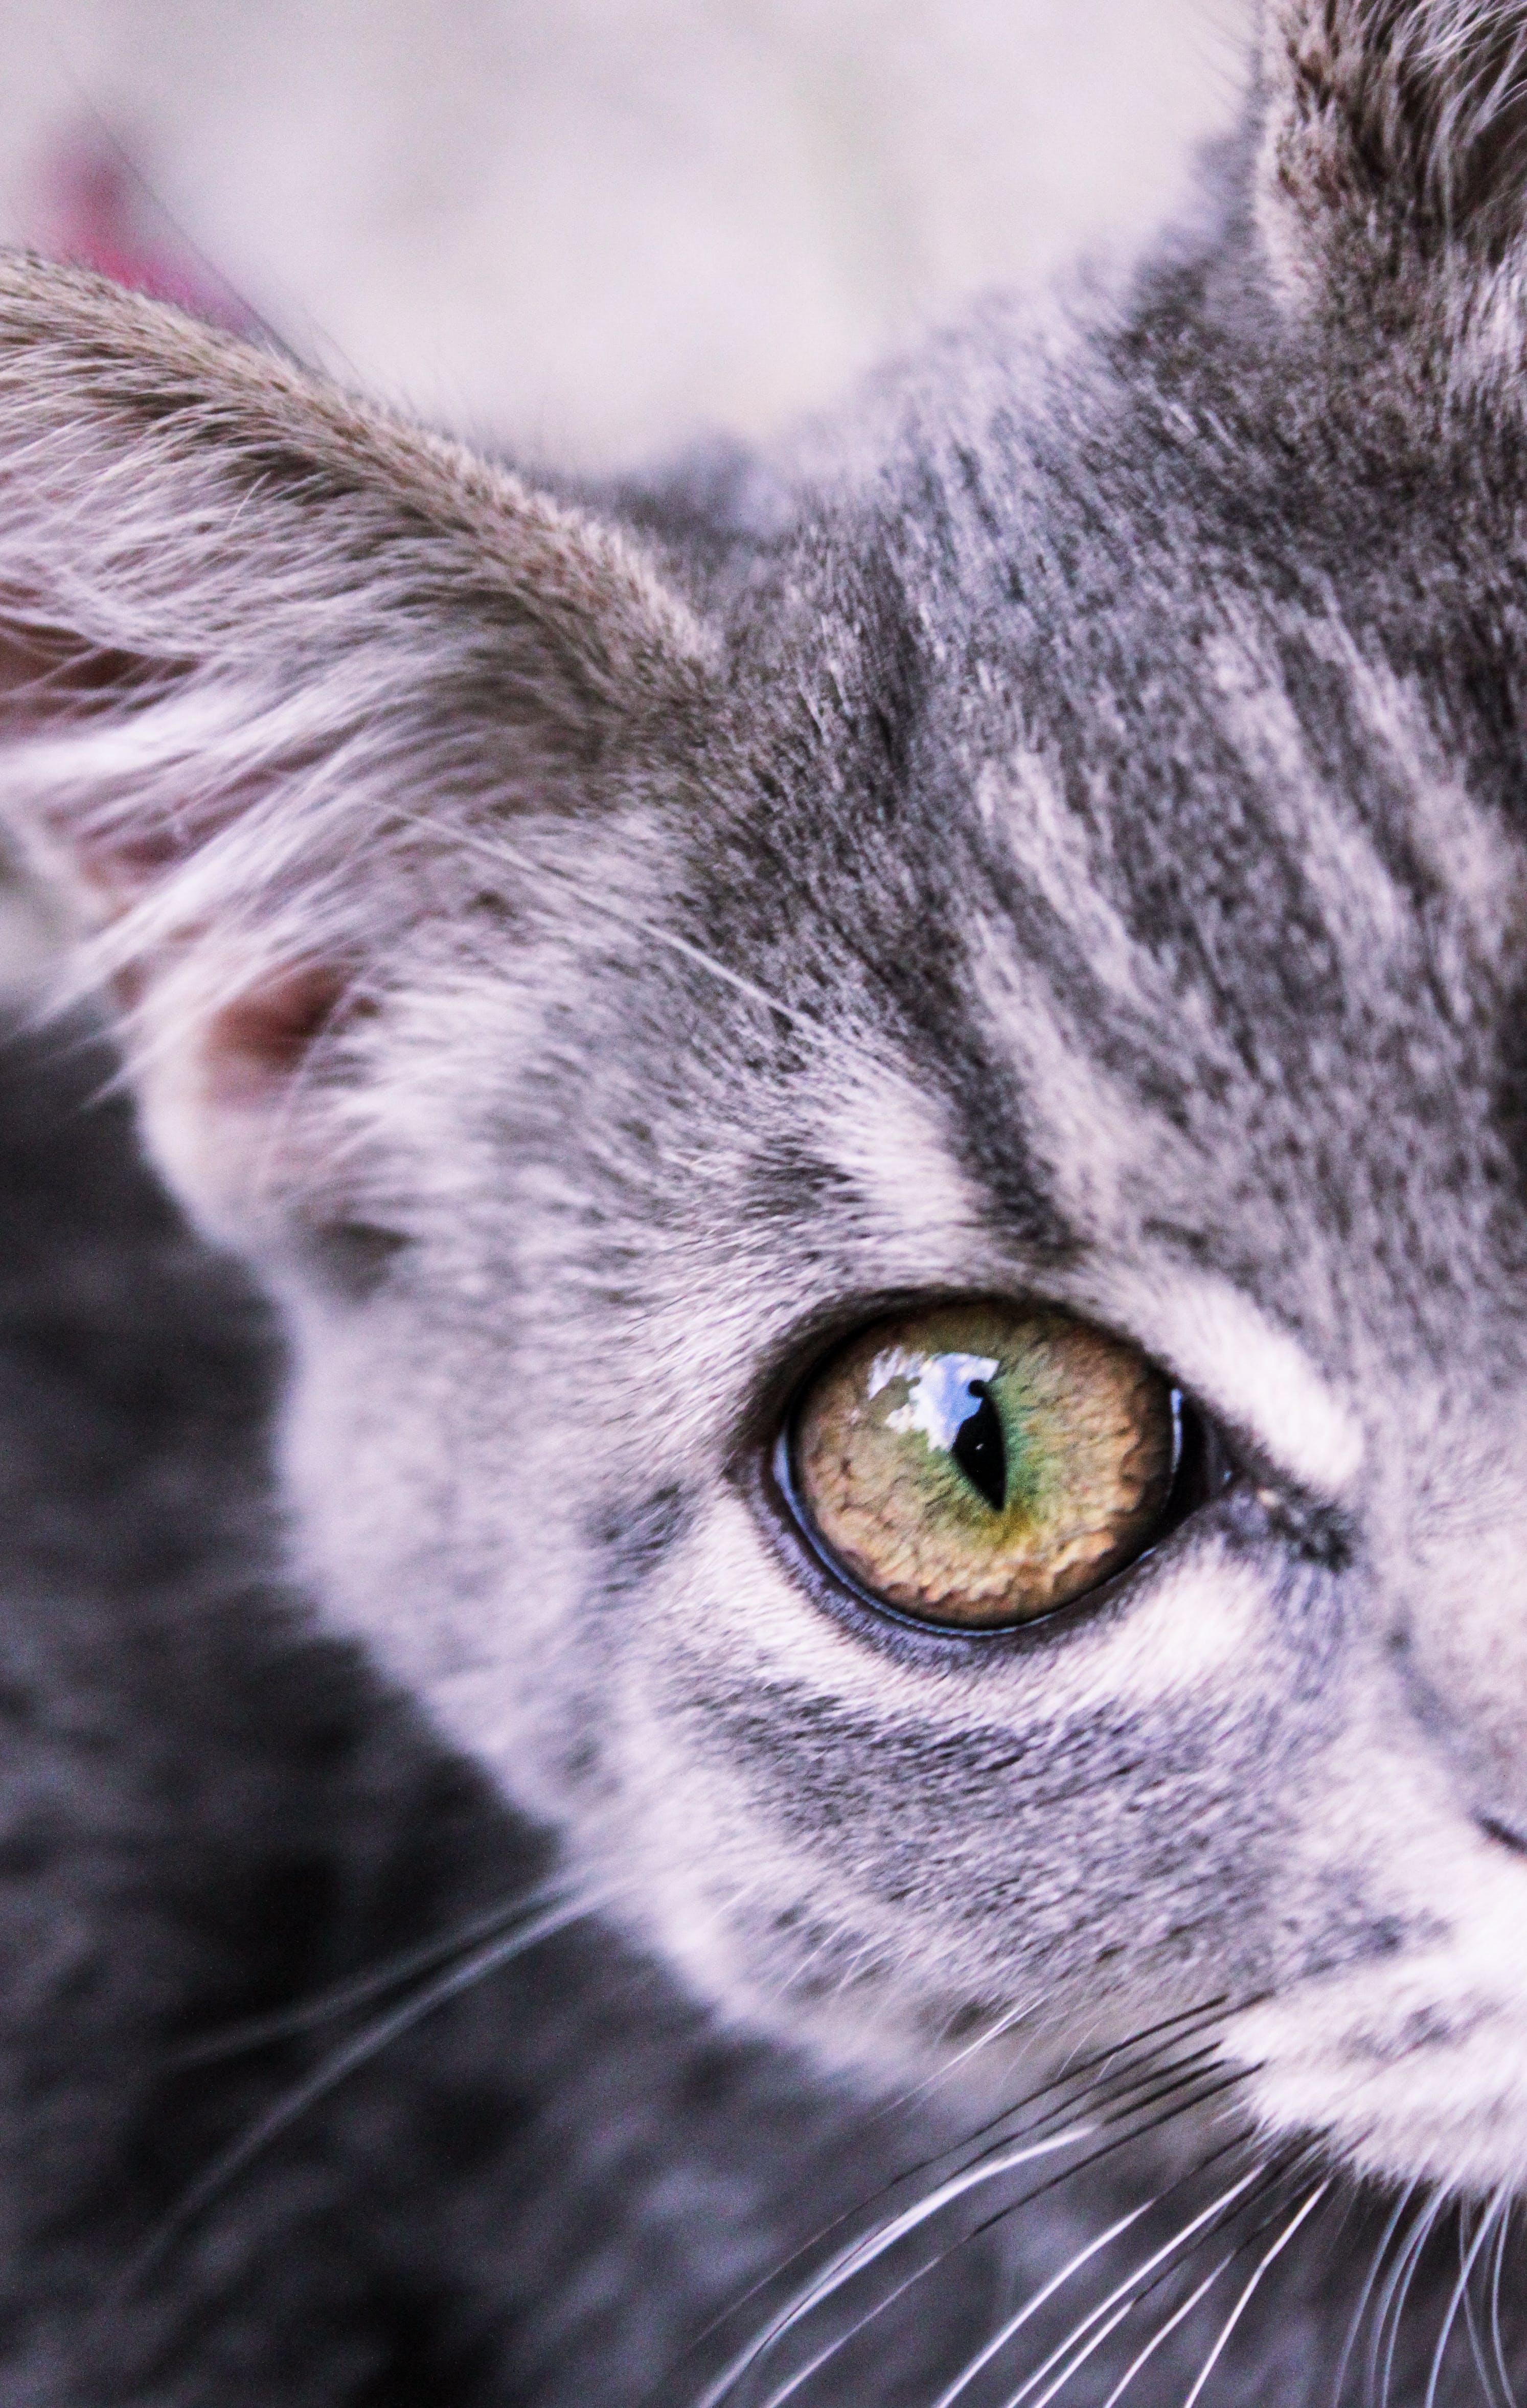 Free stock photo of animal, cat, cats, closeup